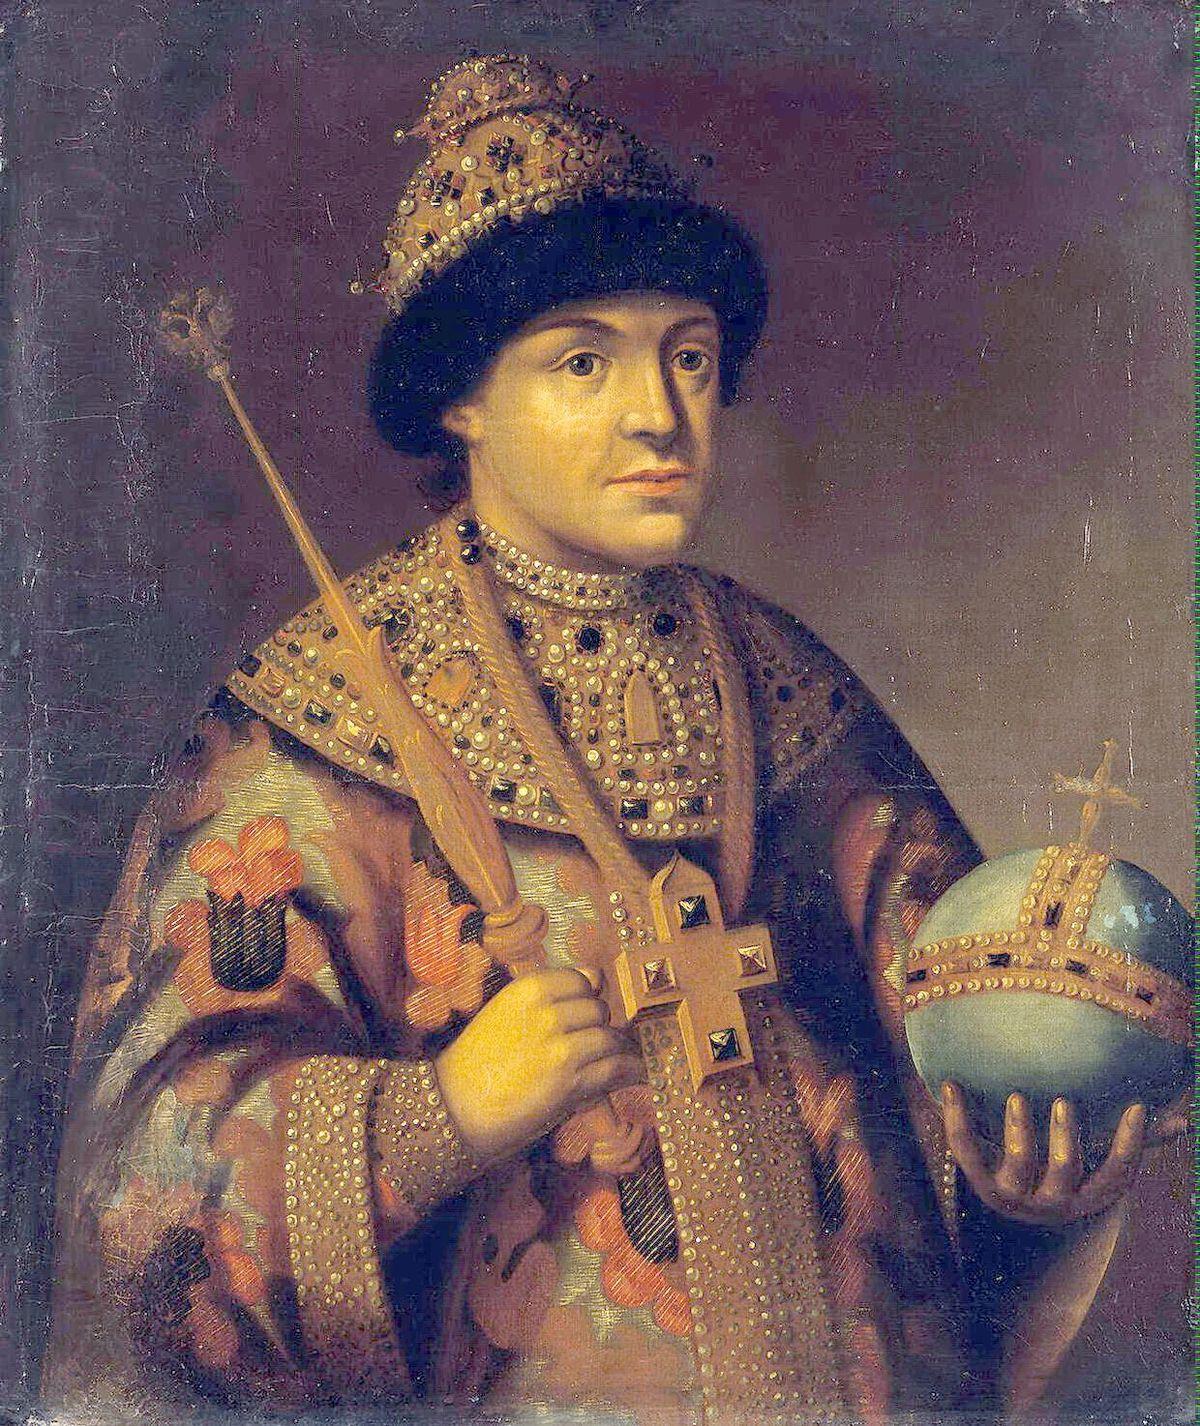 Çar Aleksei Mikhailovich Romanov